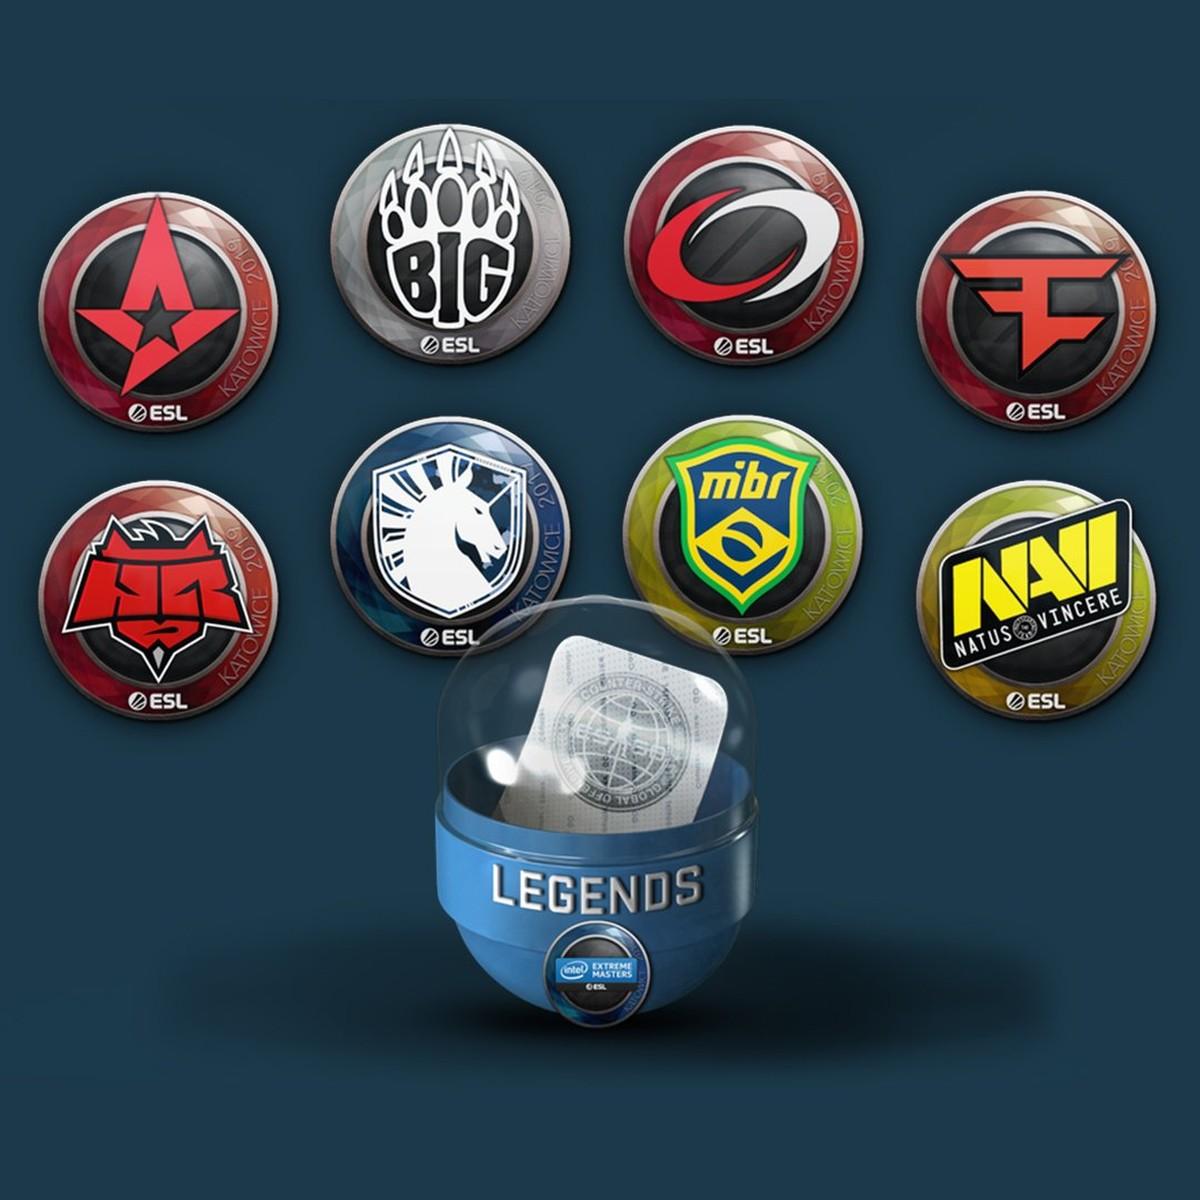 stickers.jpg (1200×1200)